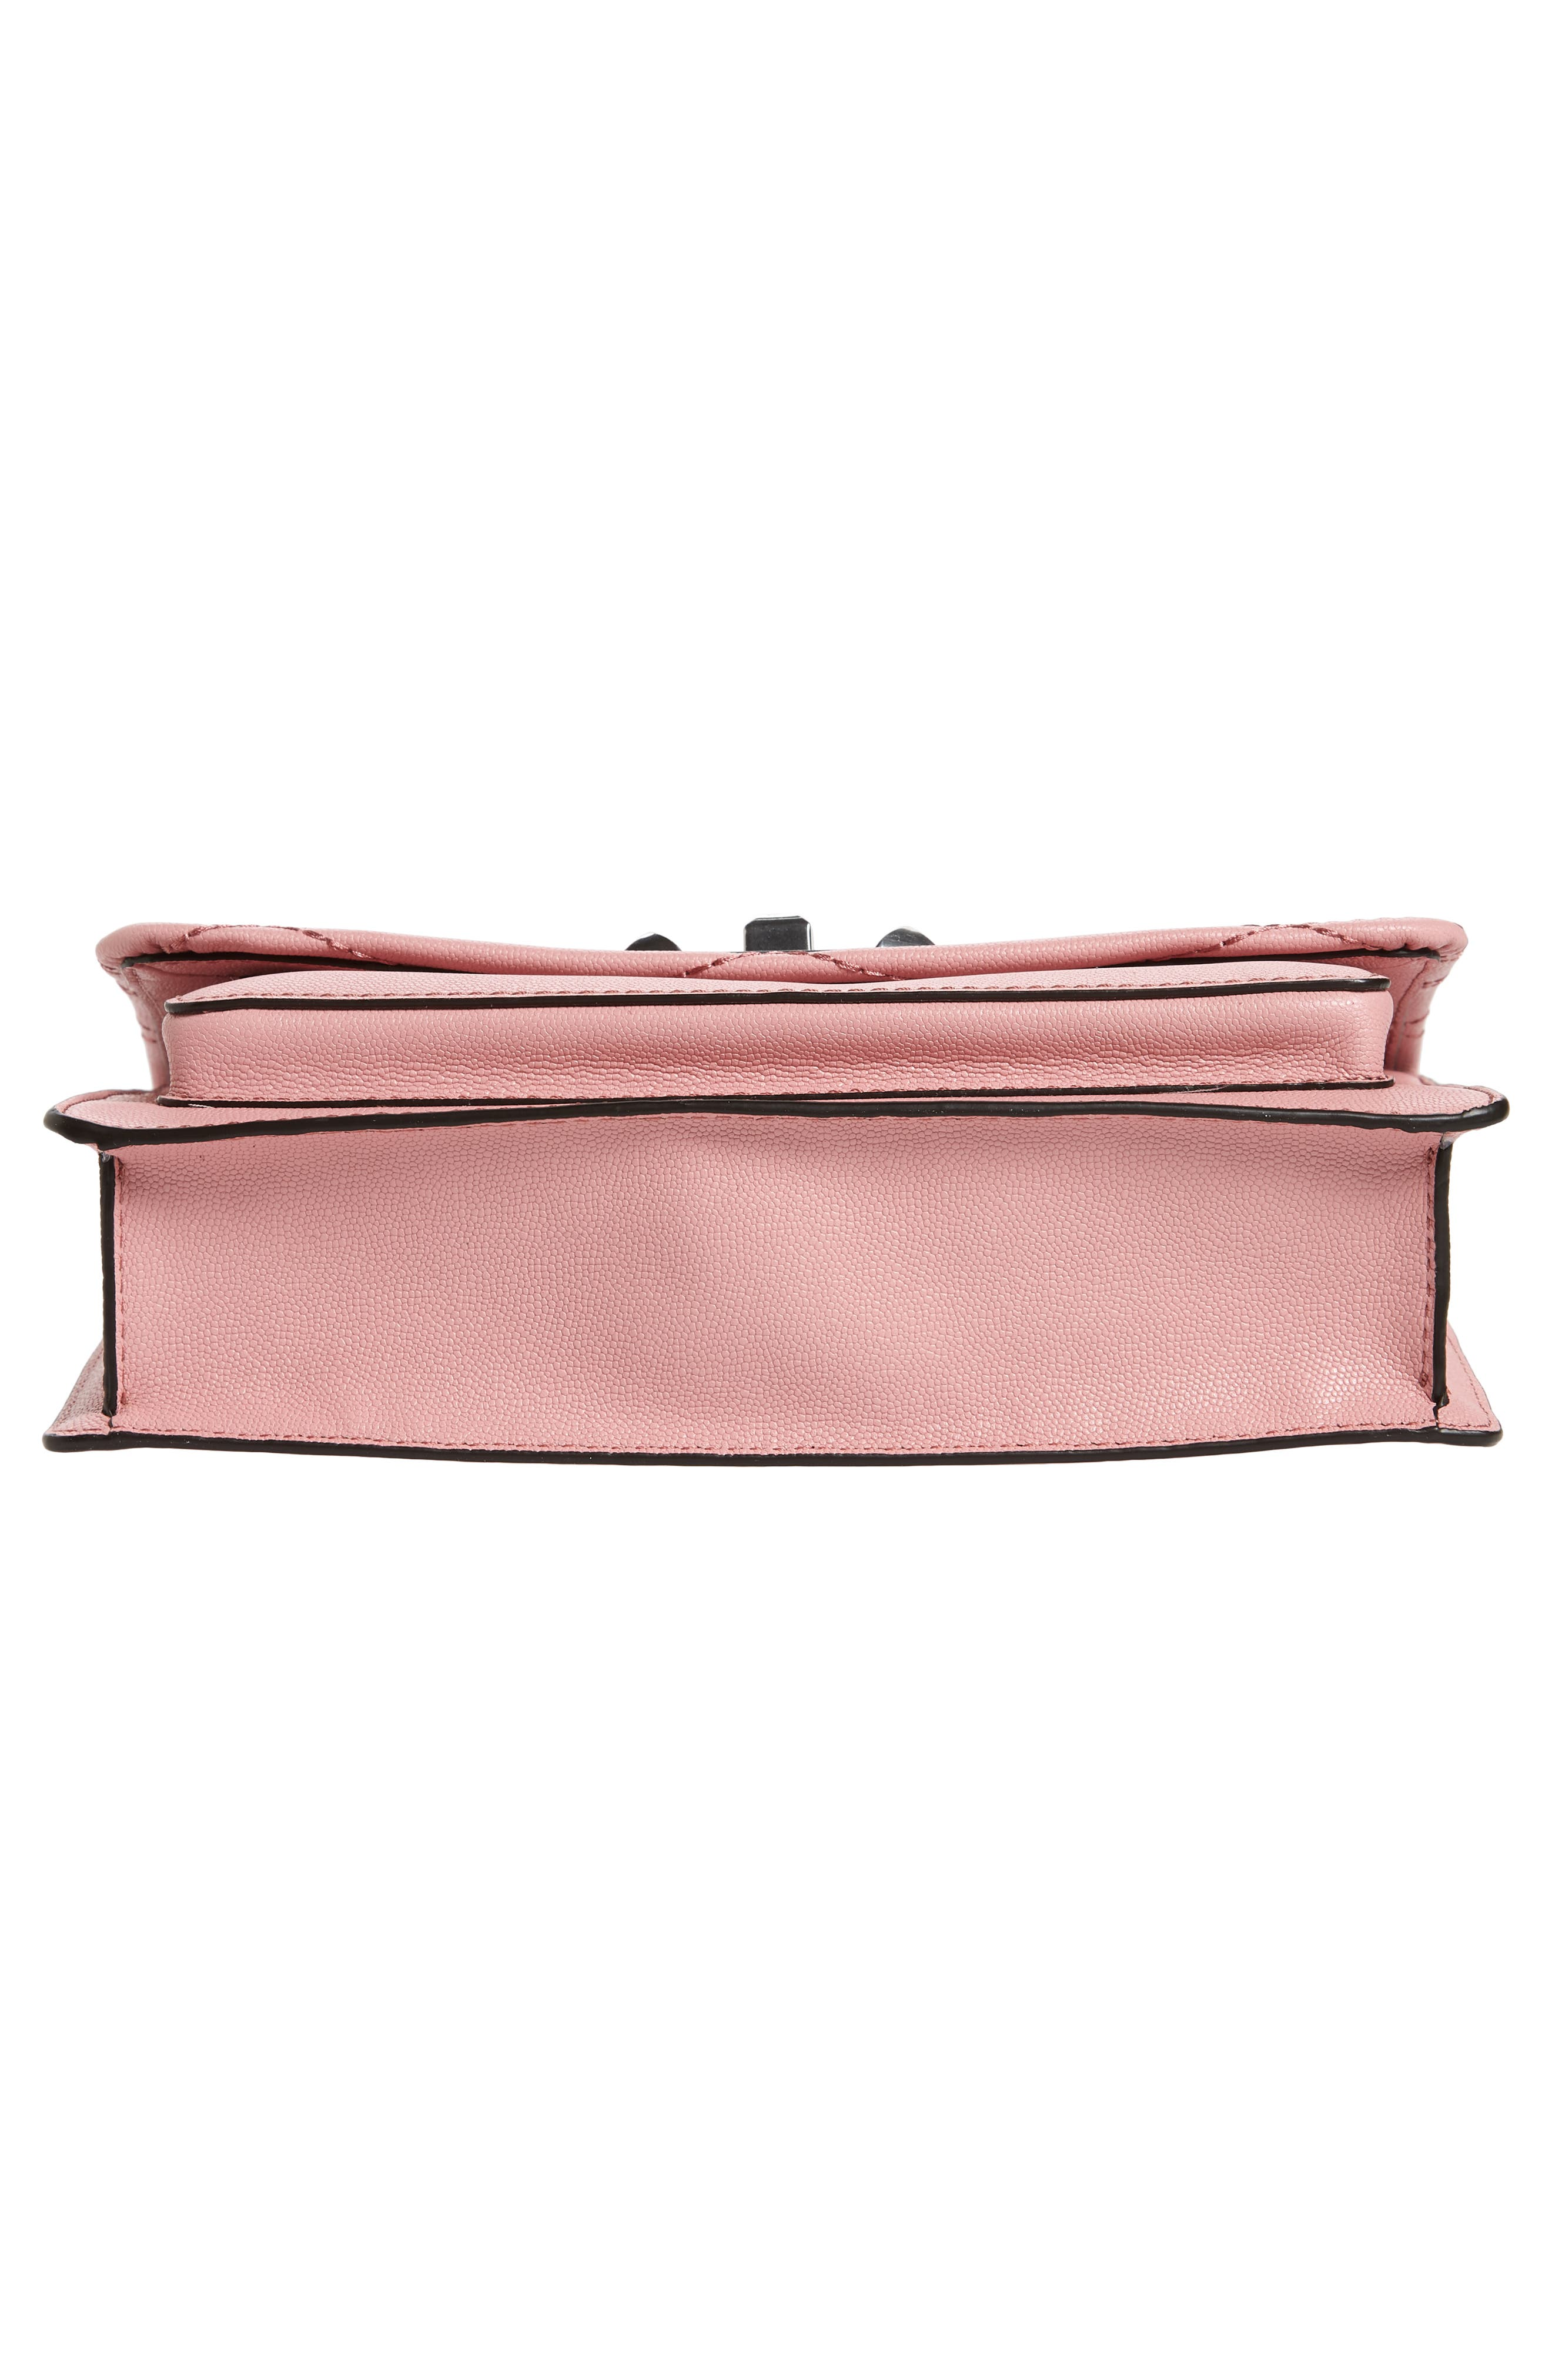 Medium Je T'aime Convertible Leather Crossbody Bag,                             Alternate thumbnail 59, color,